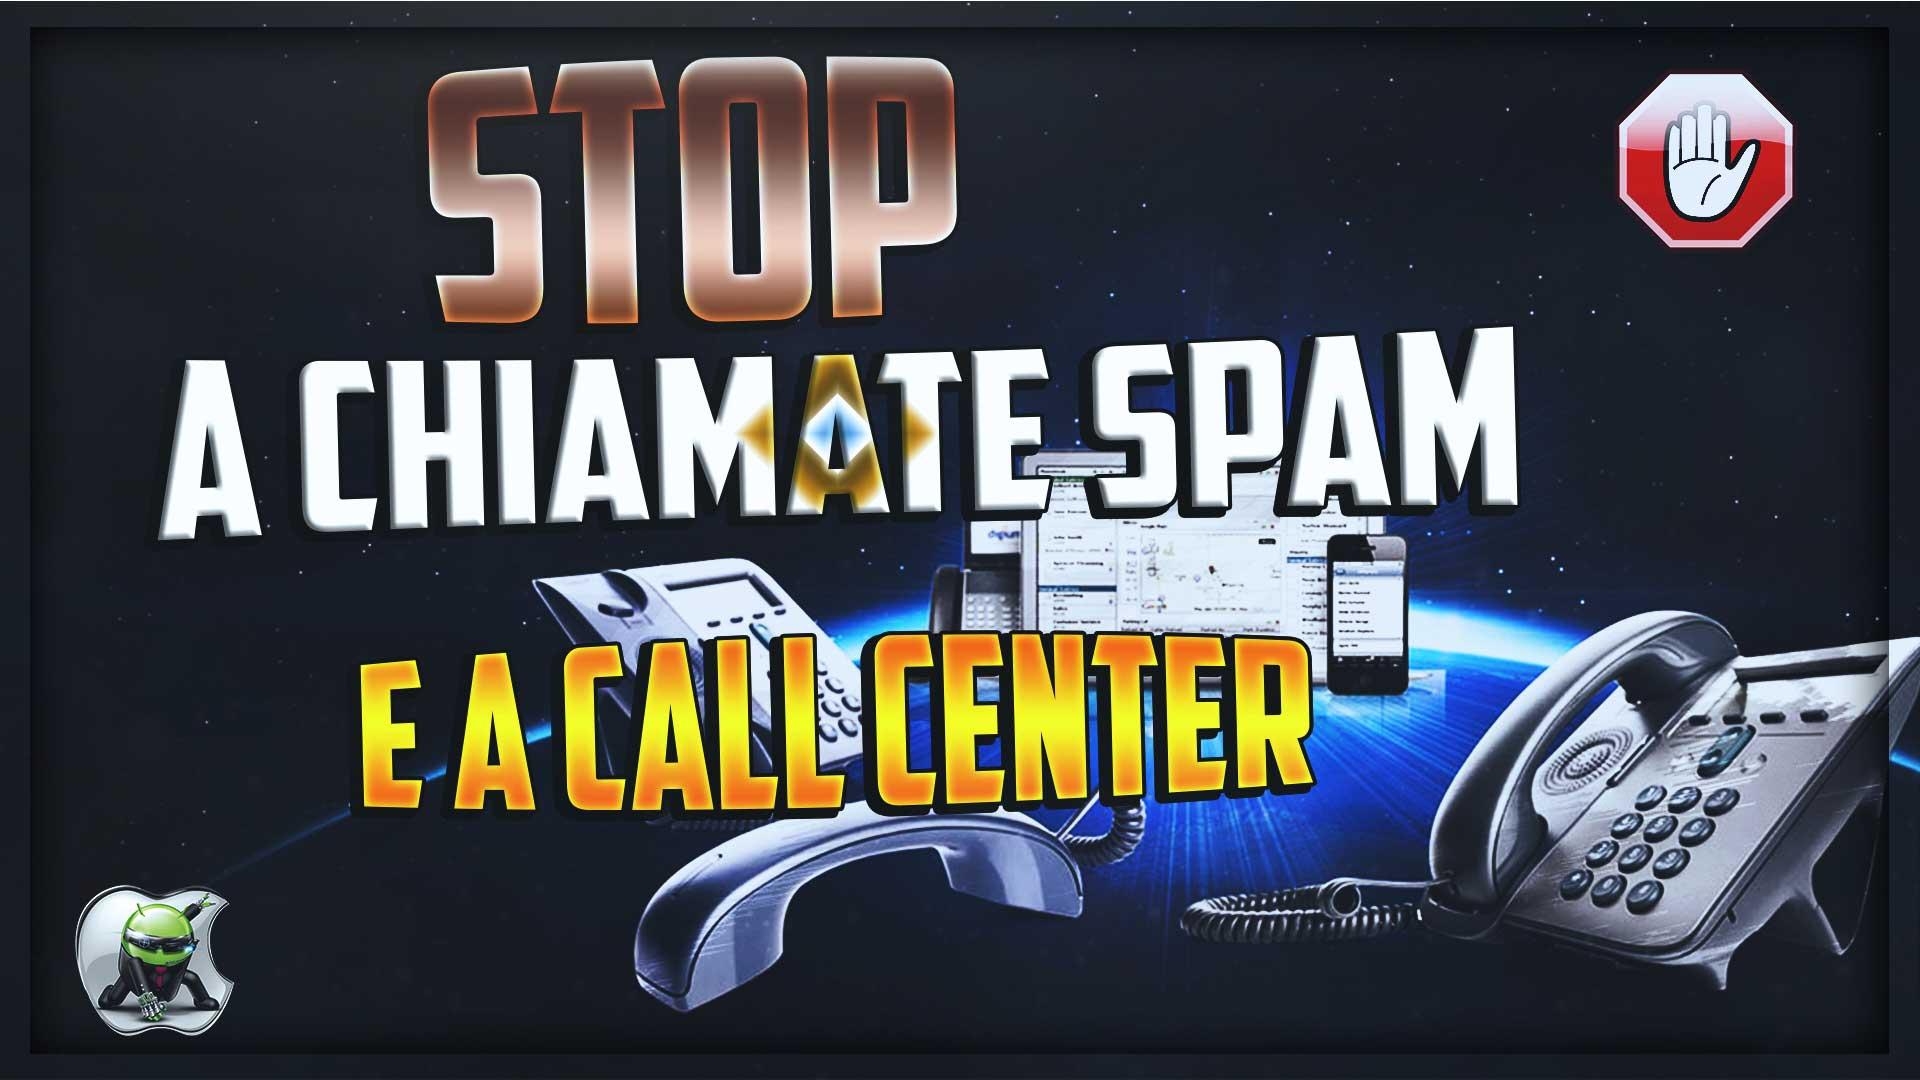 Stop a chiamate SPAM e Call Center